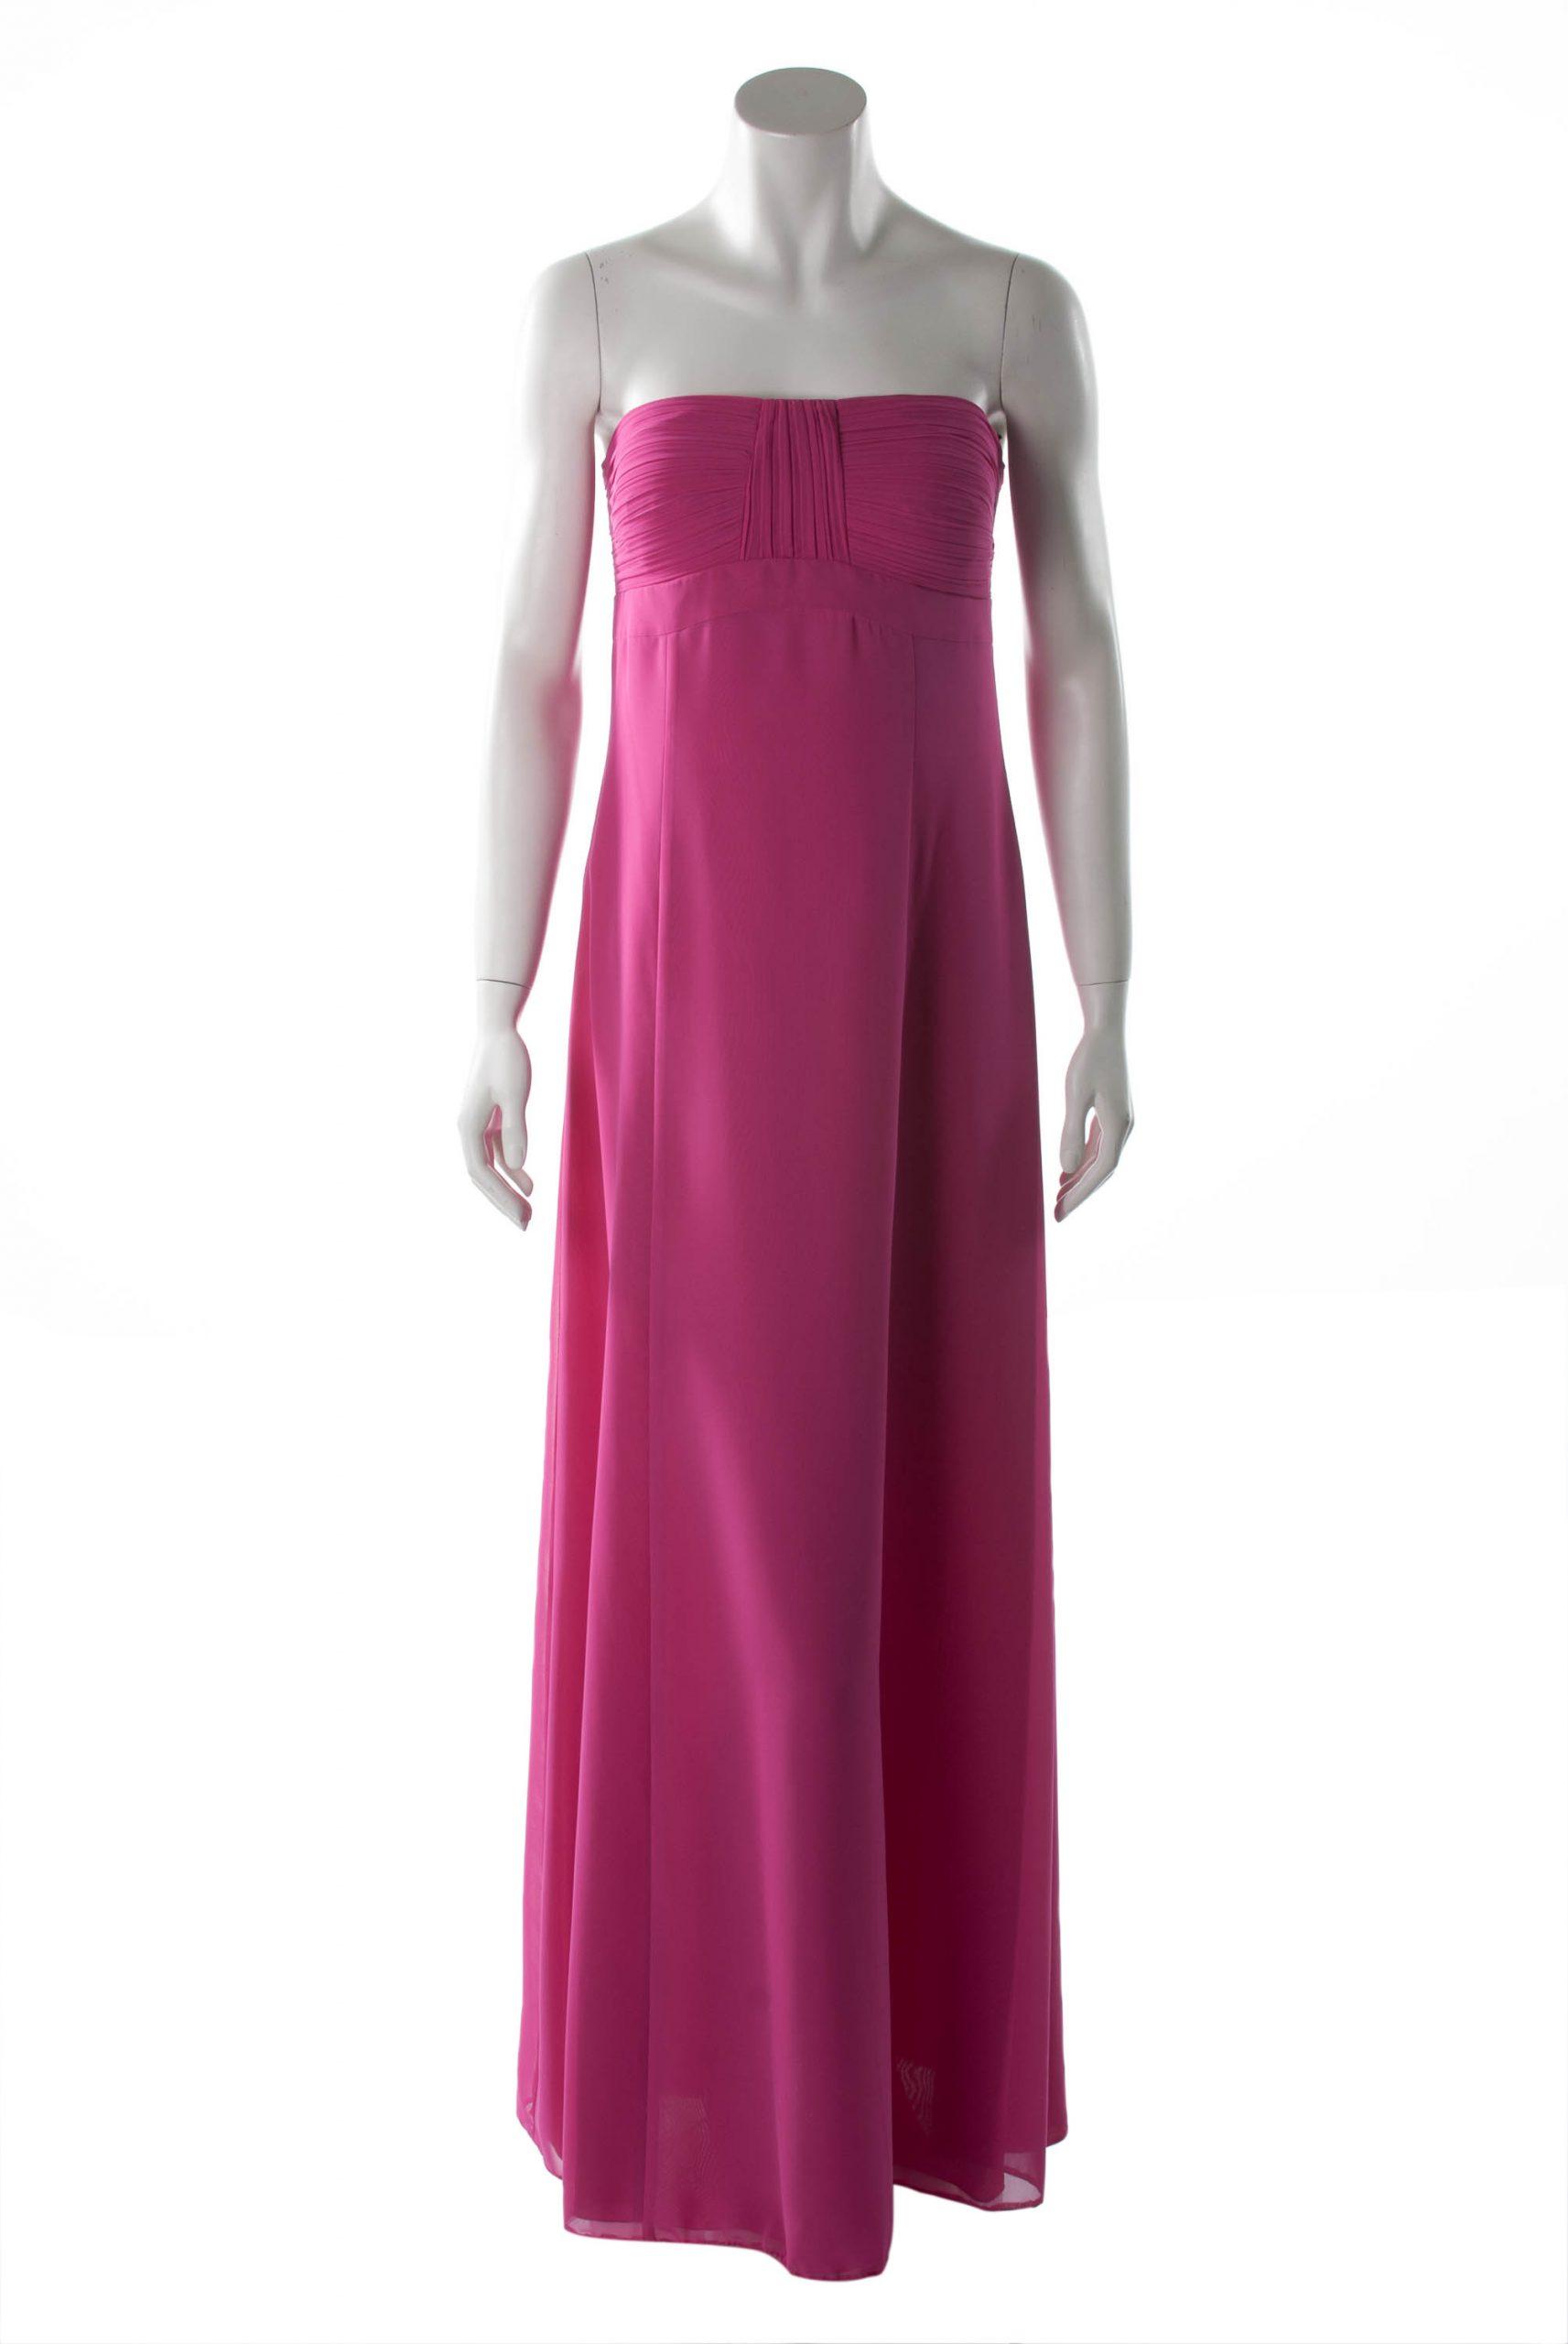 13 Genial Pinkes Abendkleid Stylish Fantastisch Pinkes Abendkleid Design